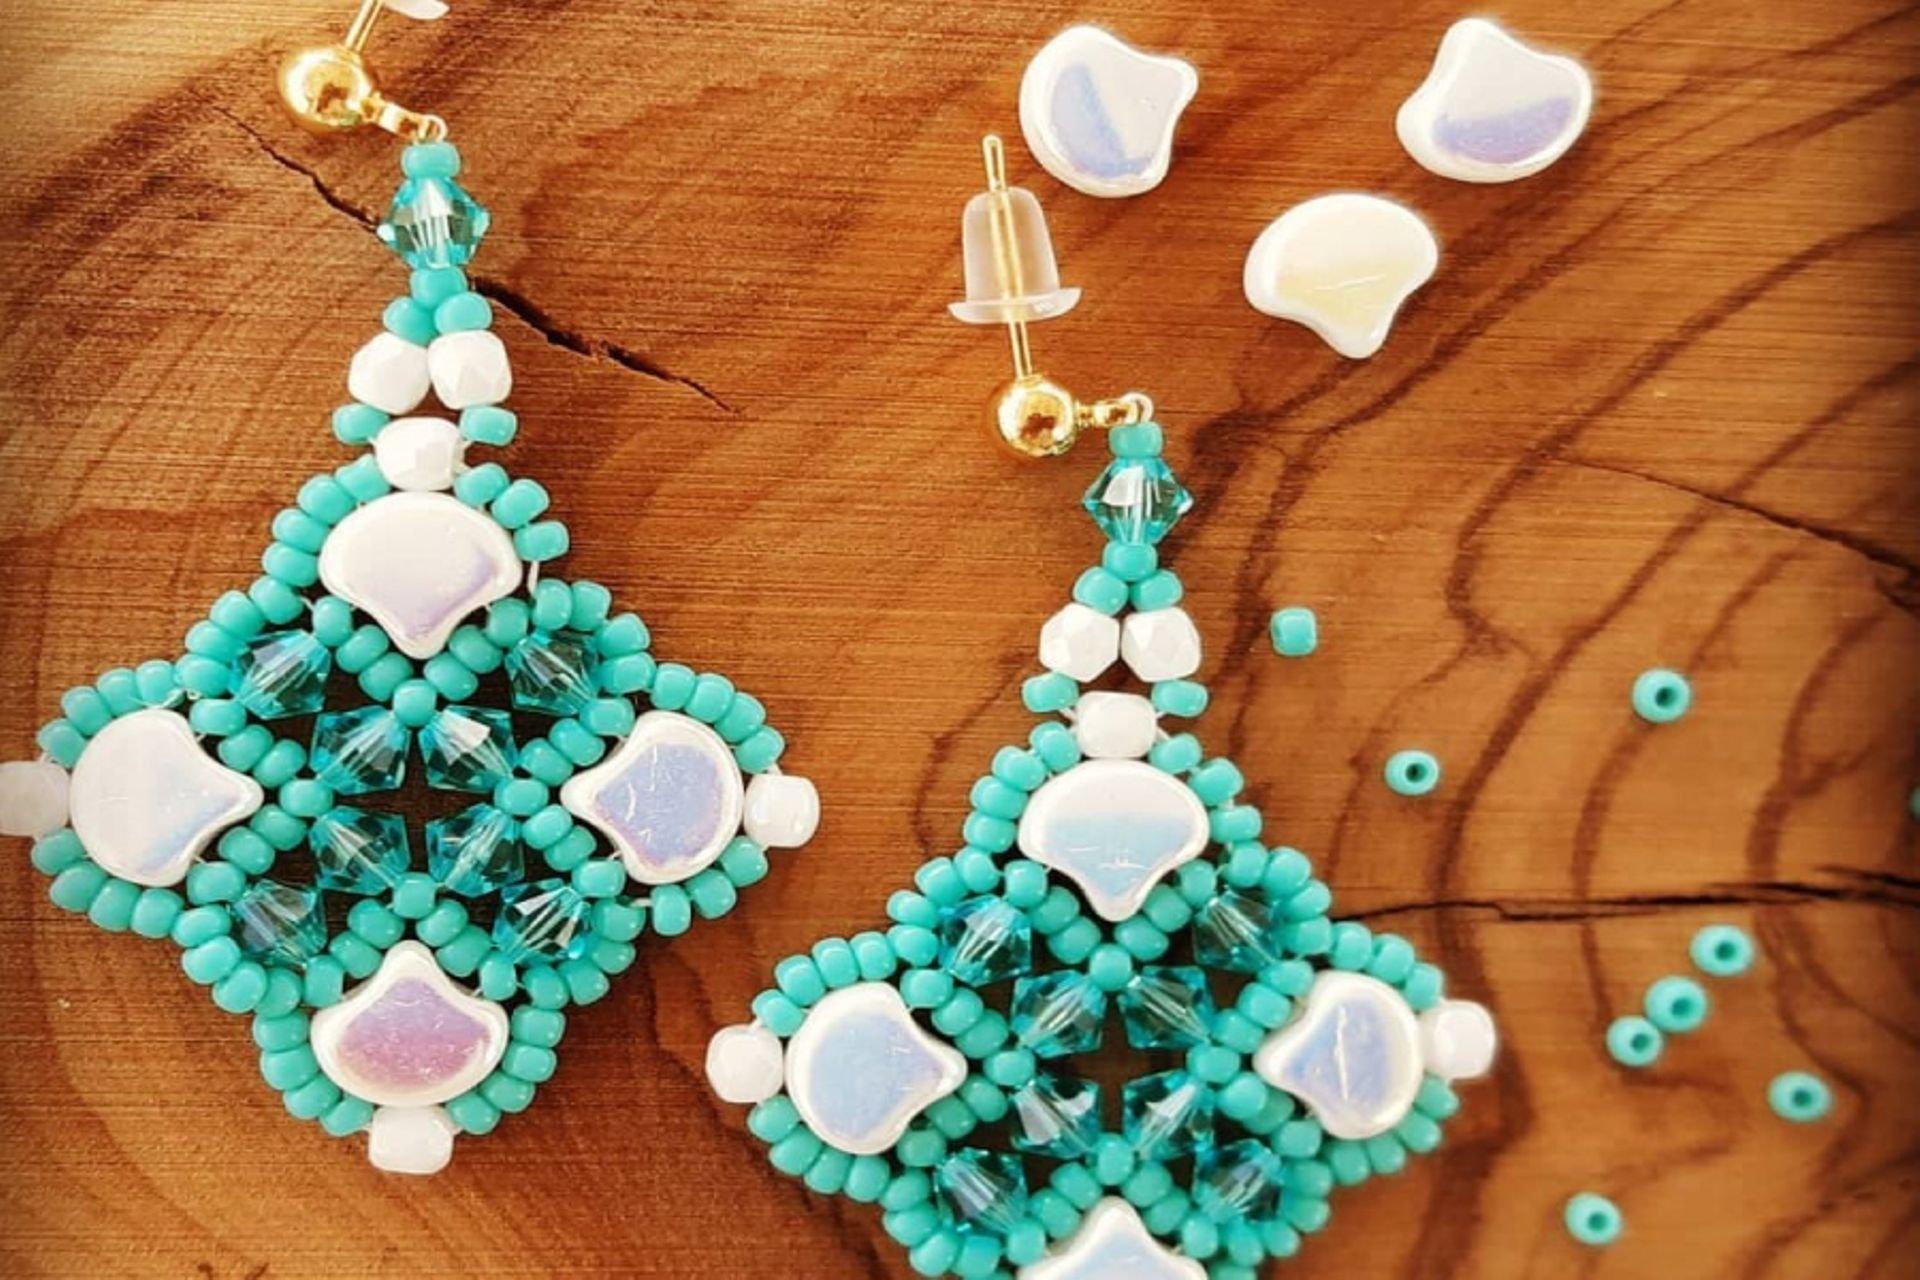 7 lantana beads jewelry designer תְמוּנָה